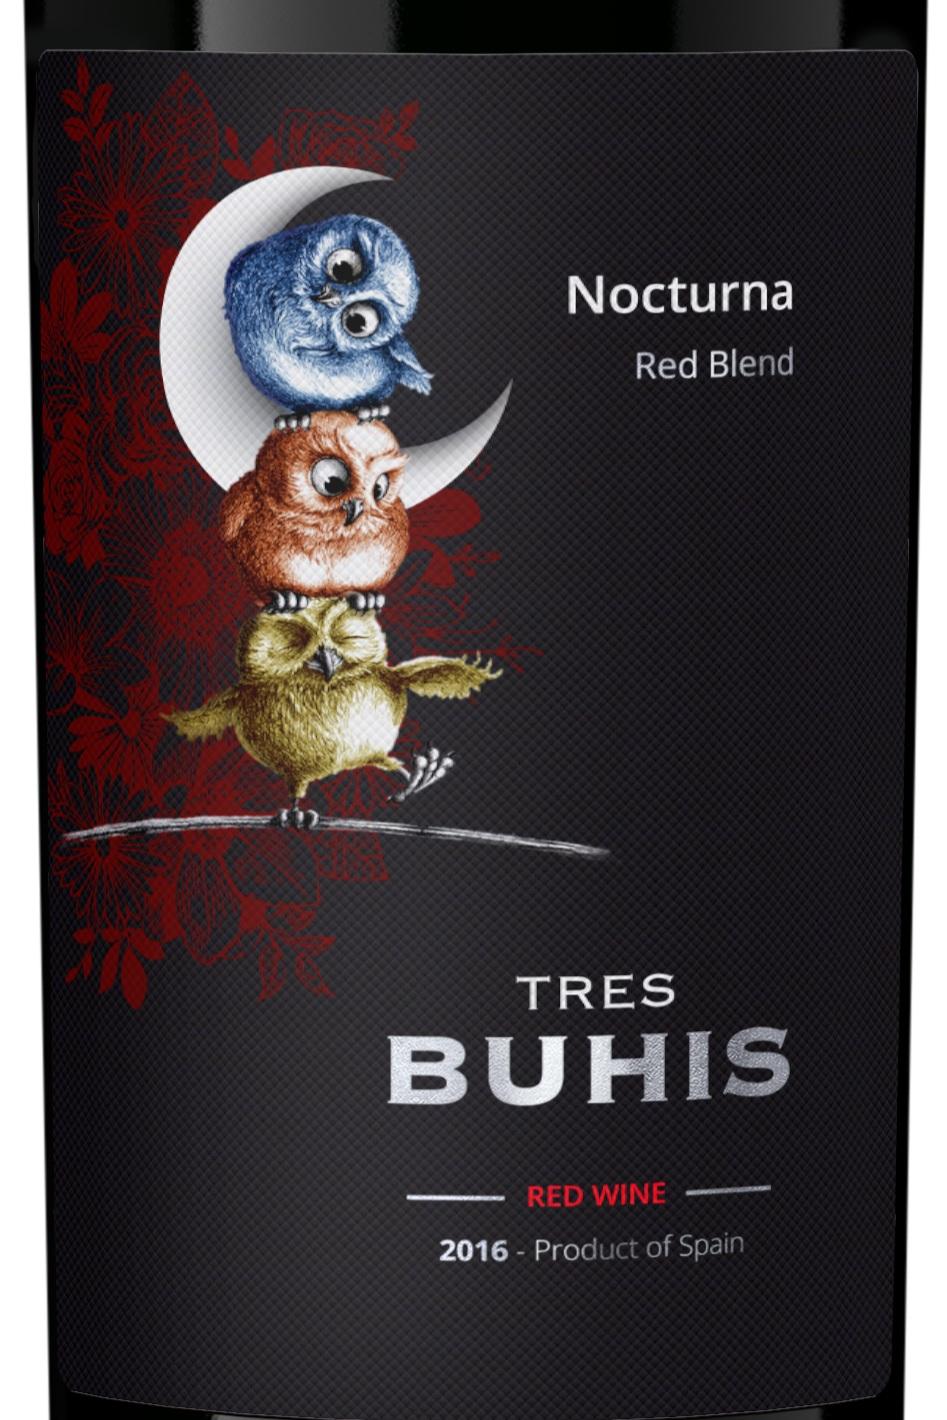 Tres-Buhis_Nocturna_1.jpg